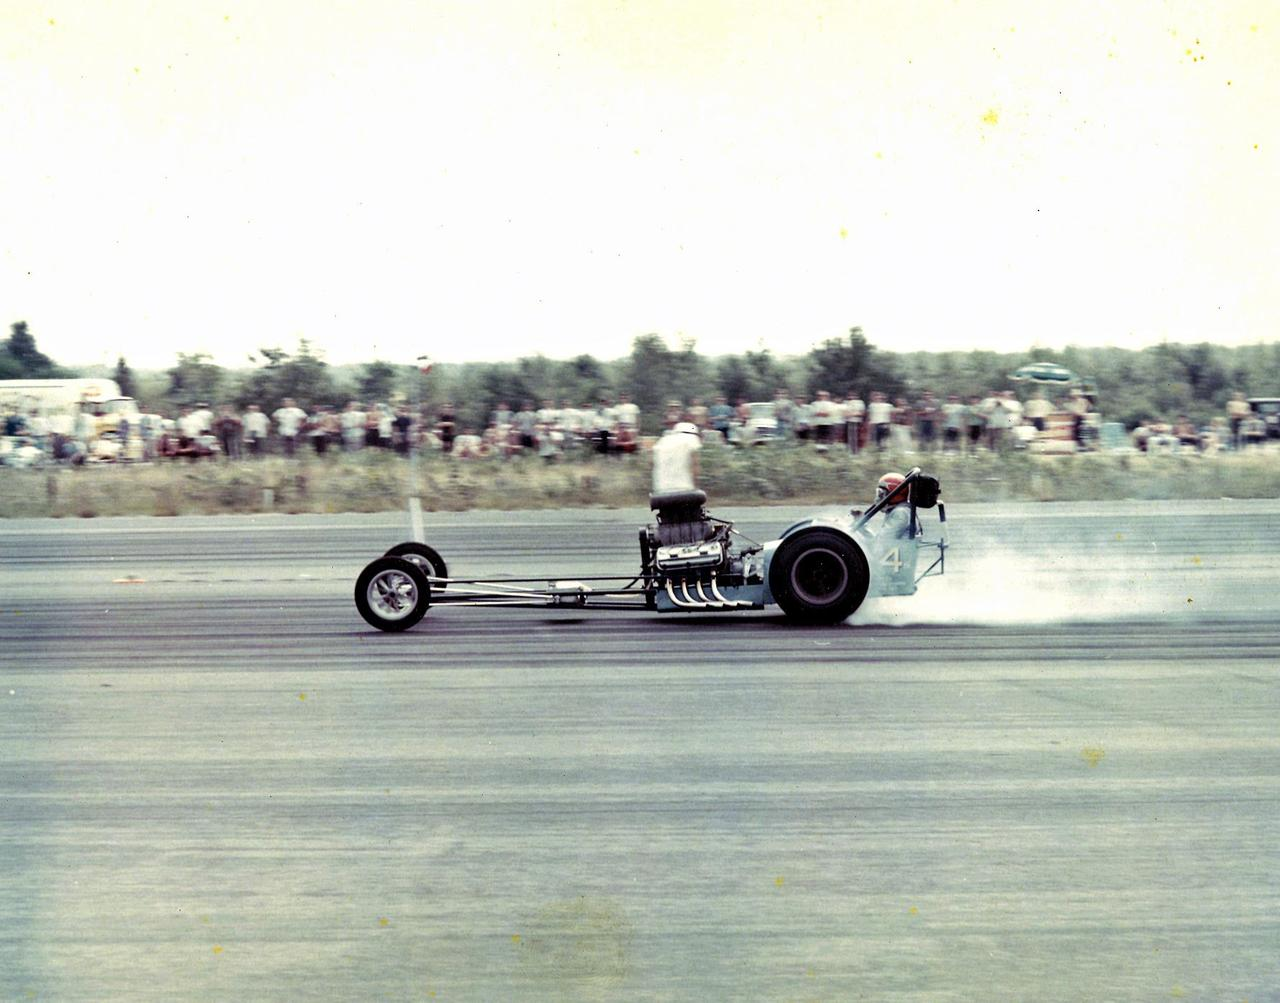 BangShift.com sanford maine drag racing